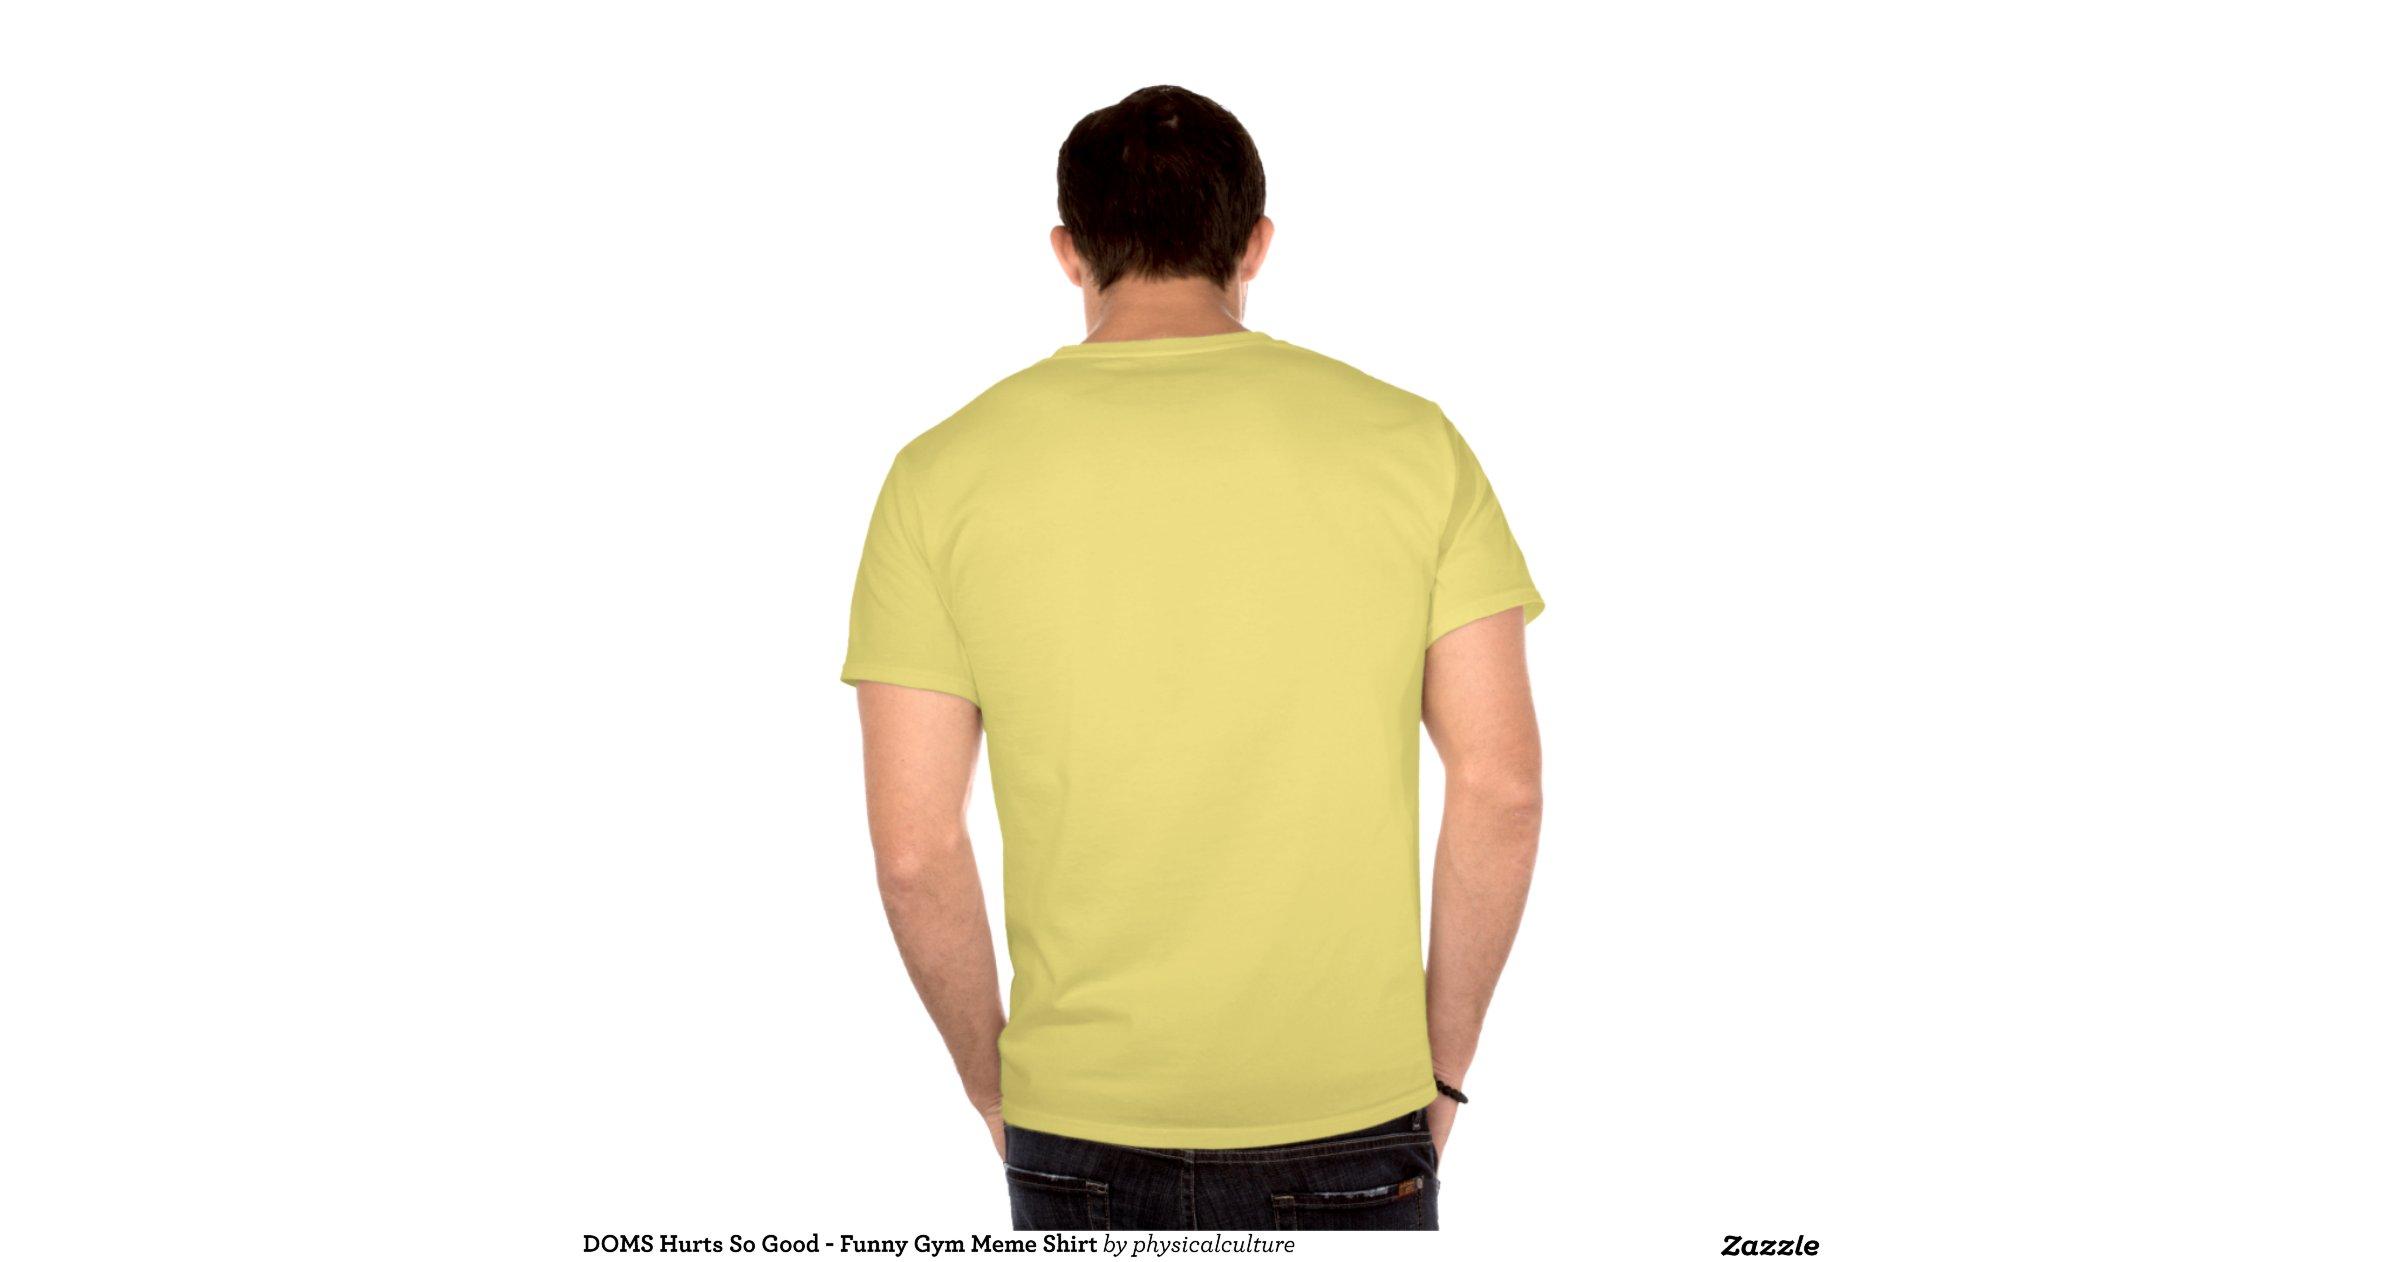 Funny Gym Meme Shirts : Doms hurts so good funny gym meme shirt